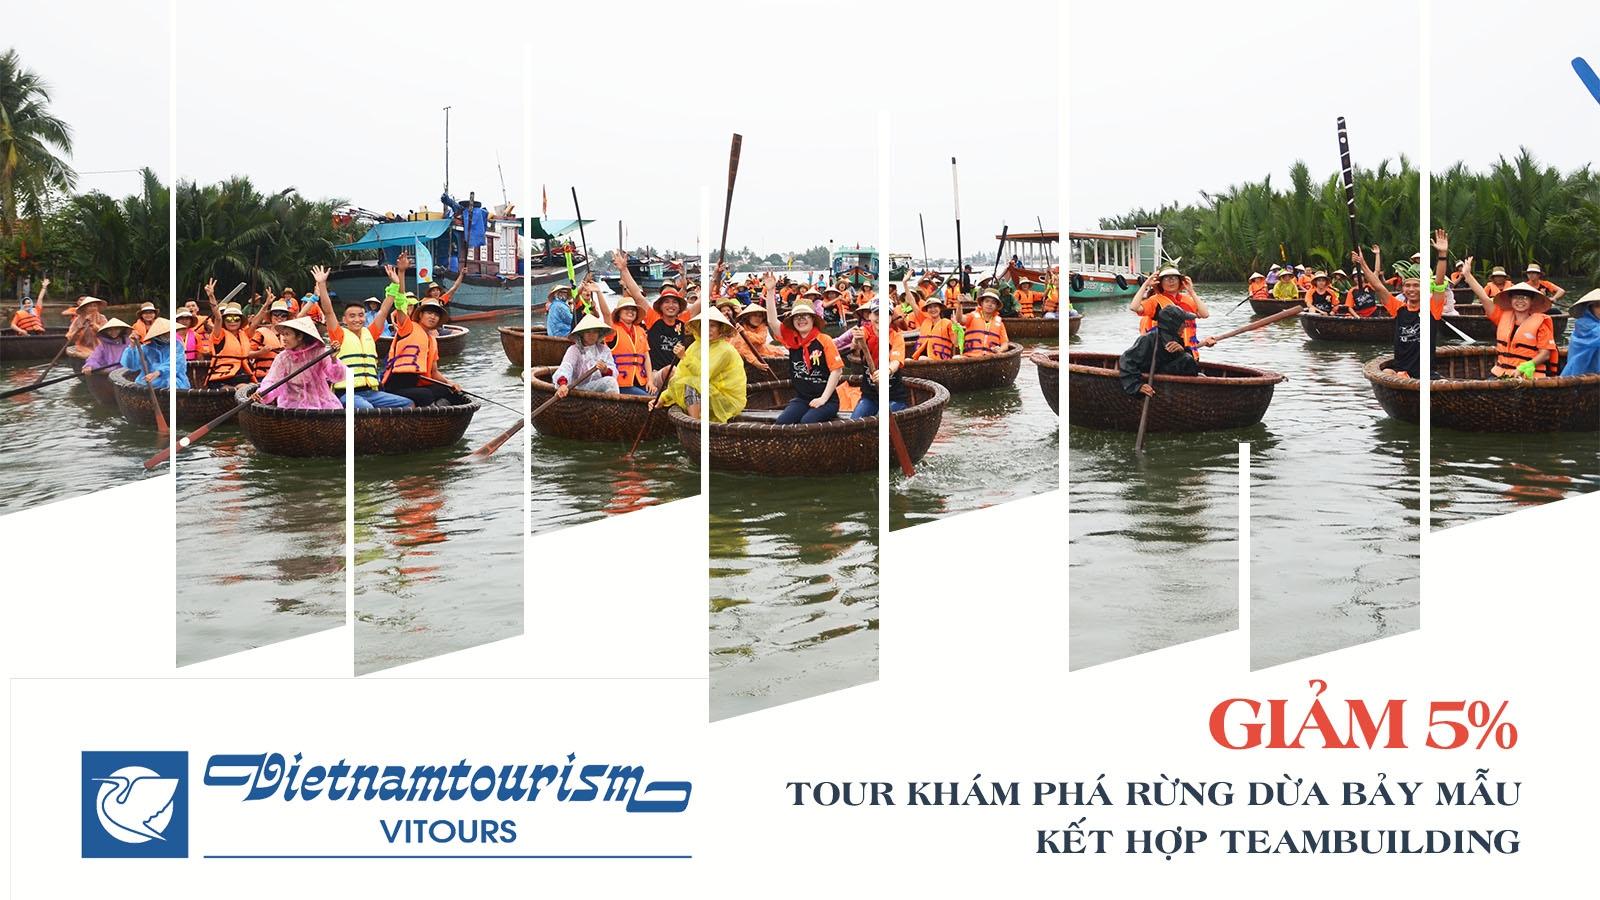 Vitours | Giảm 5% Tour tham quan Rừng Dừa Bảy Mẫu kết hợp team building 1